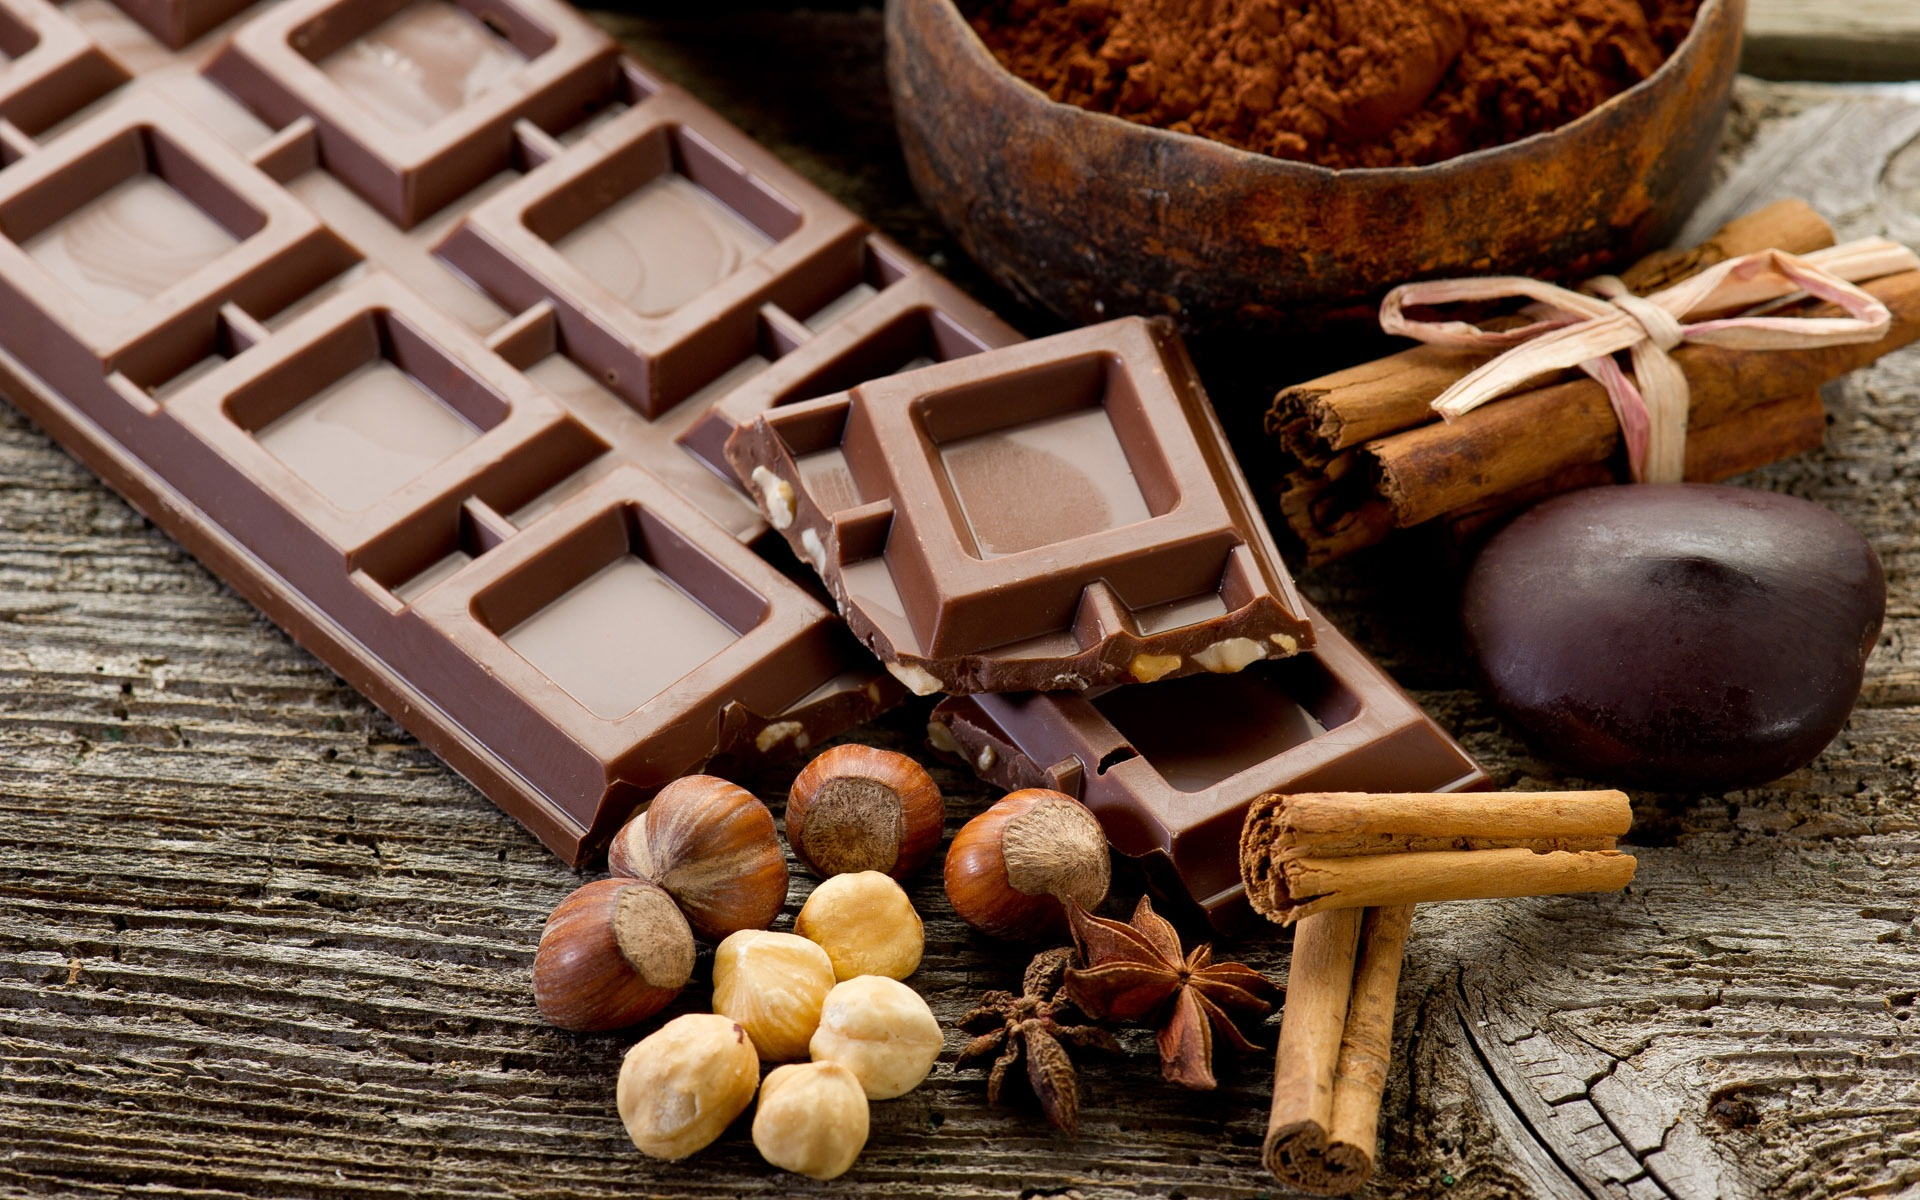 Chocolate Wallpaper Hd 23009